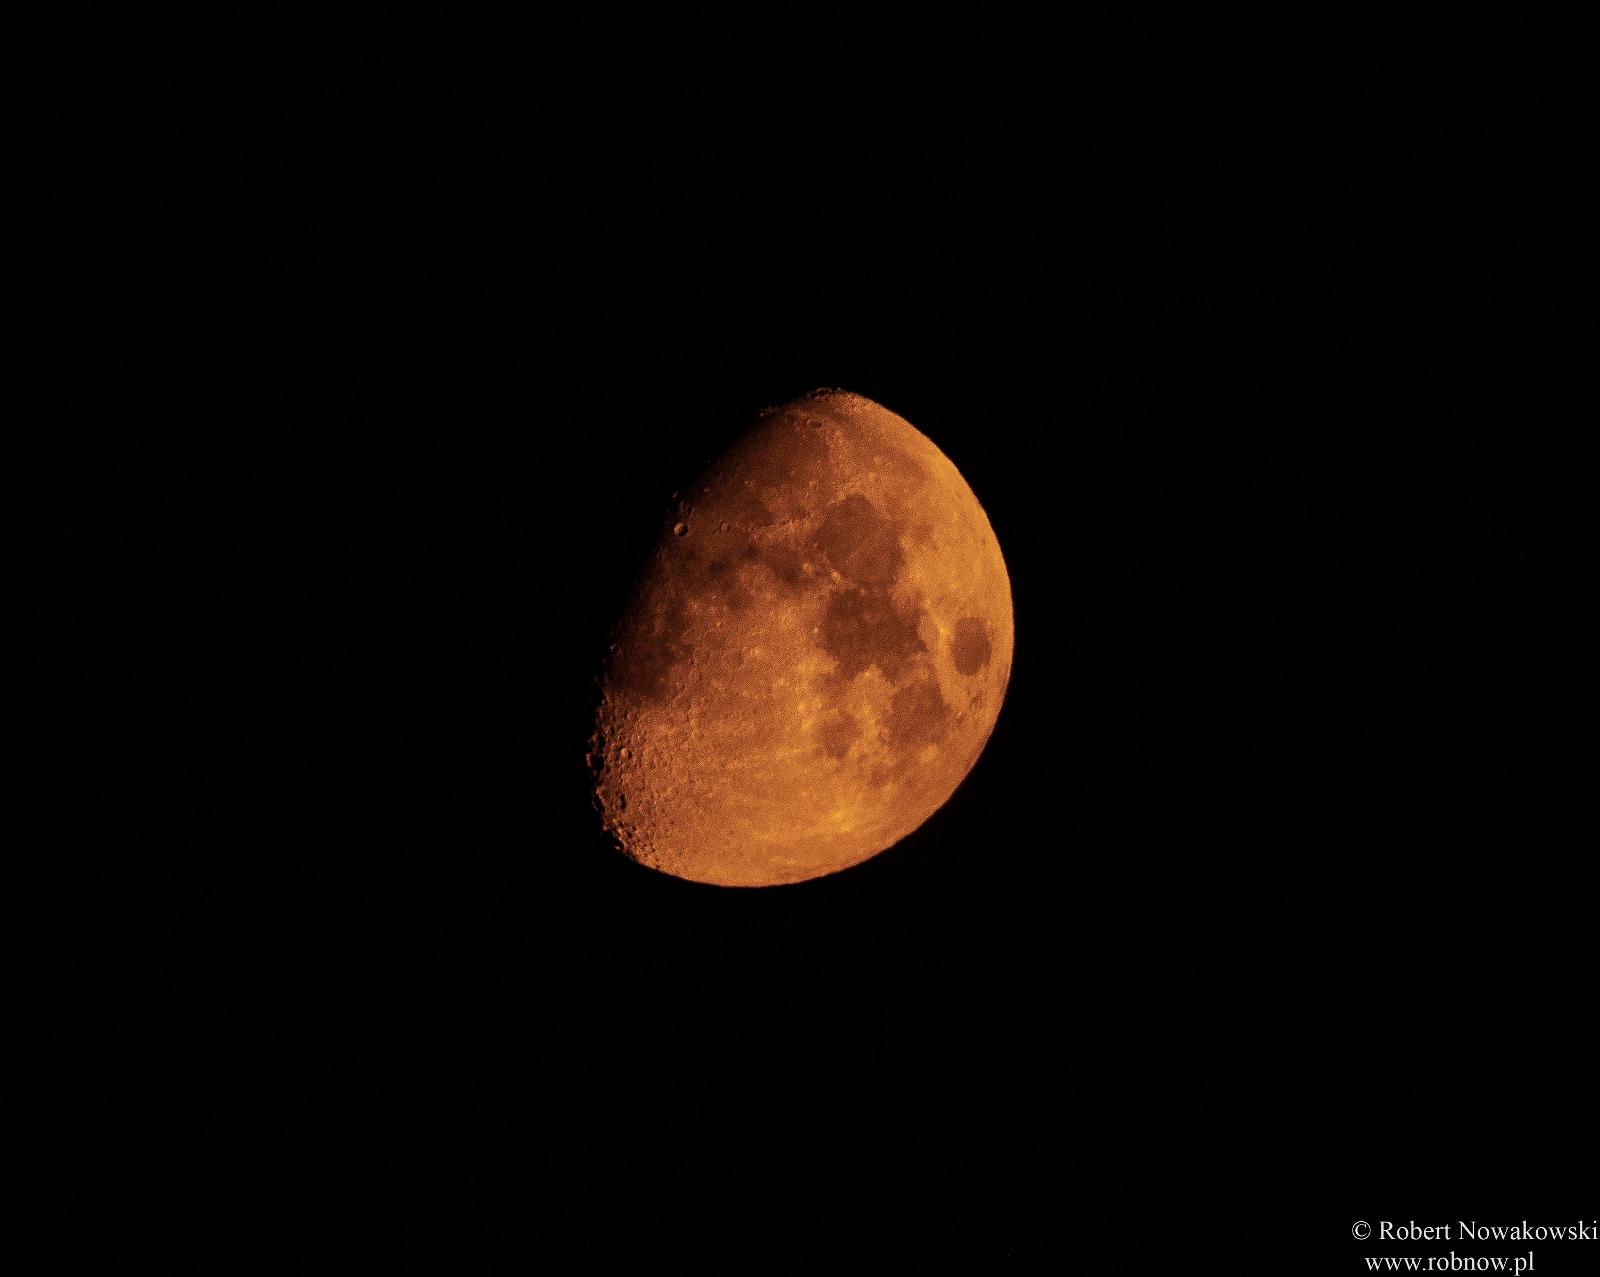 Letni Księżyc u nas na wsi...